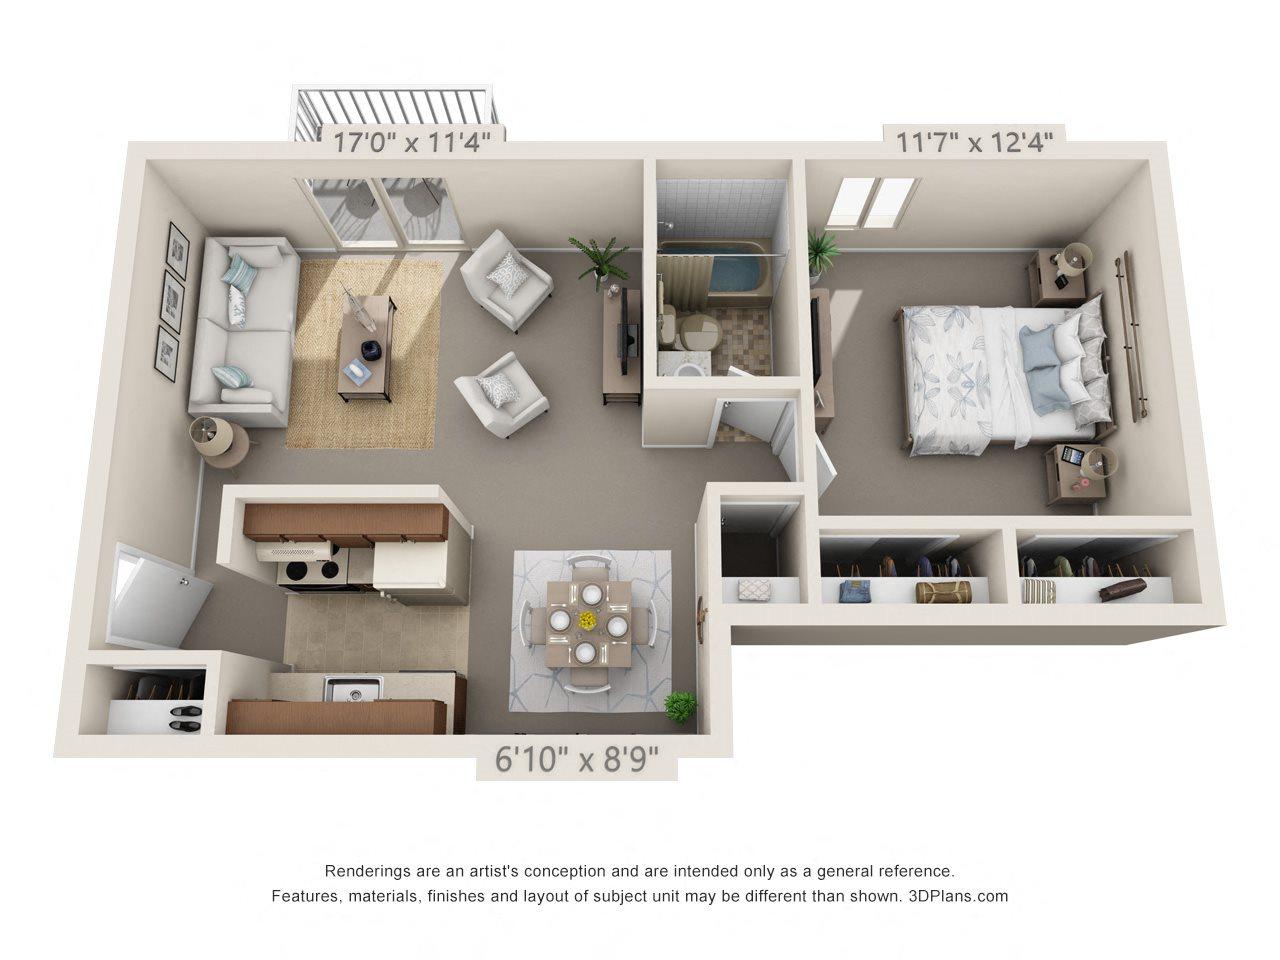 1 Bedroom, 1 Bath (Patio, Heat Paid) Floor Plan 7